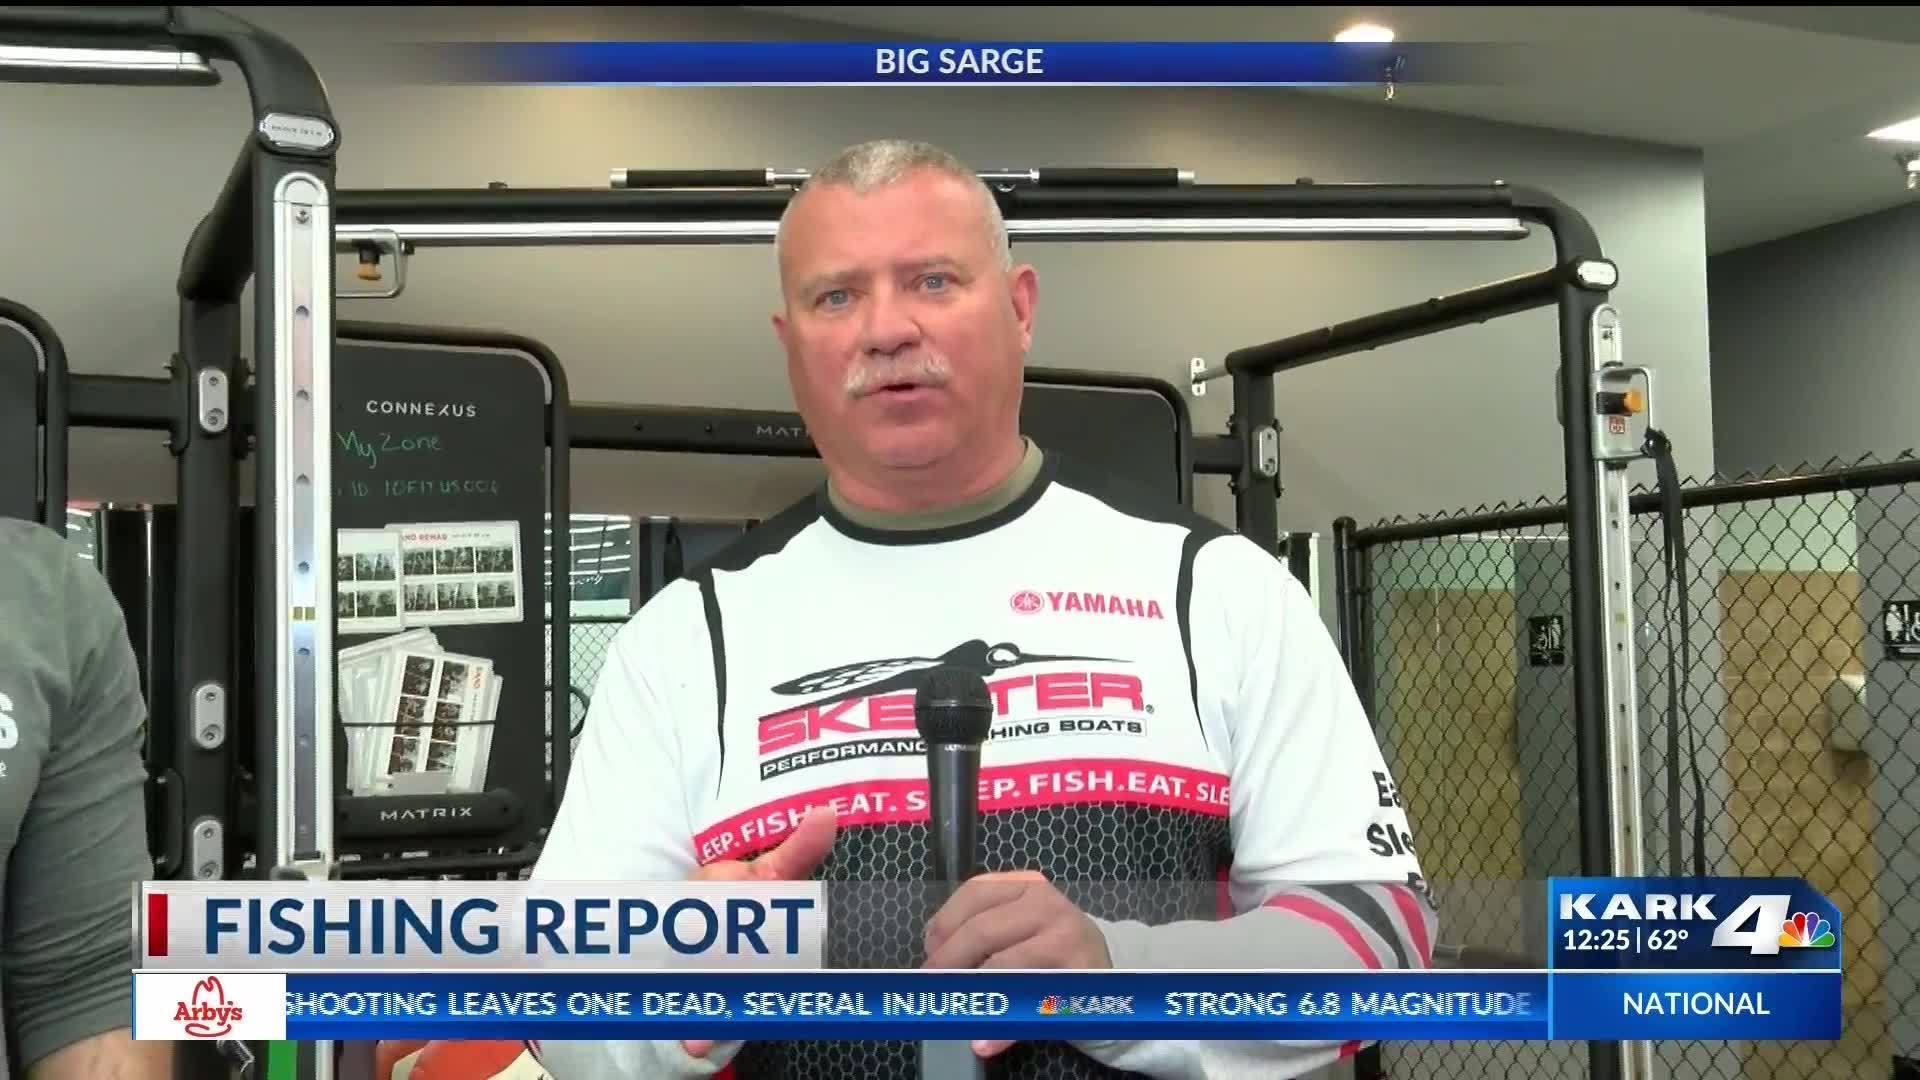 Big_Sarge_fishing_report_for_April_12_3_20190412191351-118809306